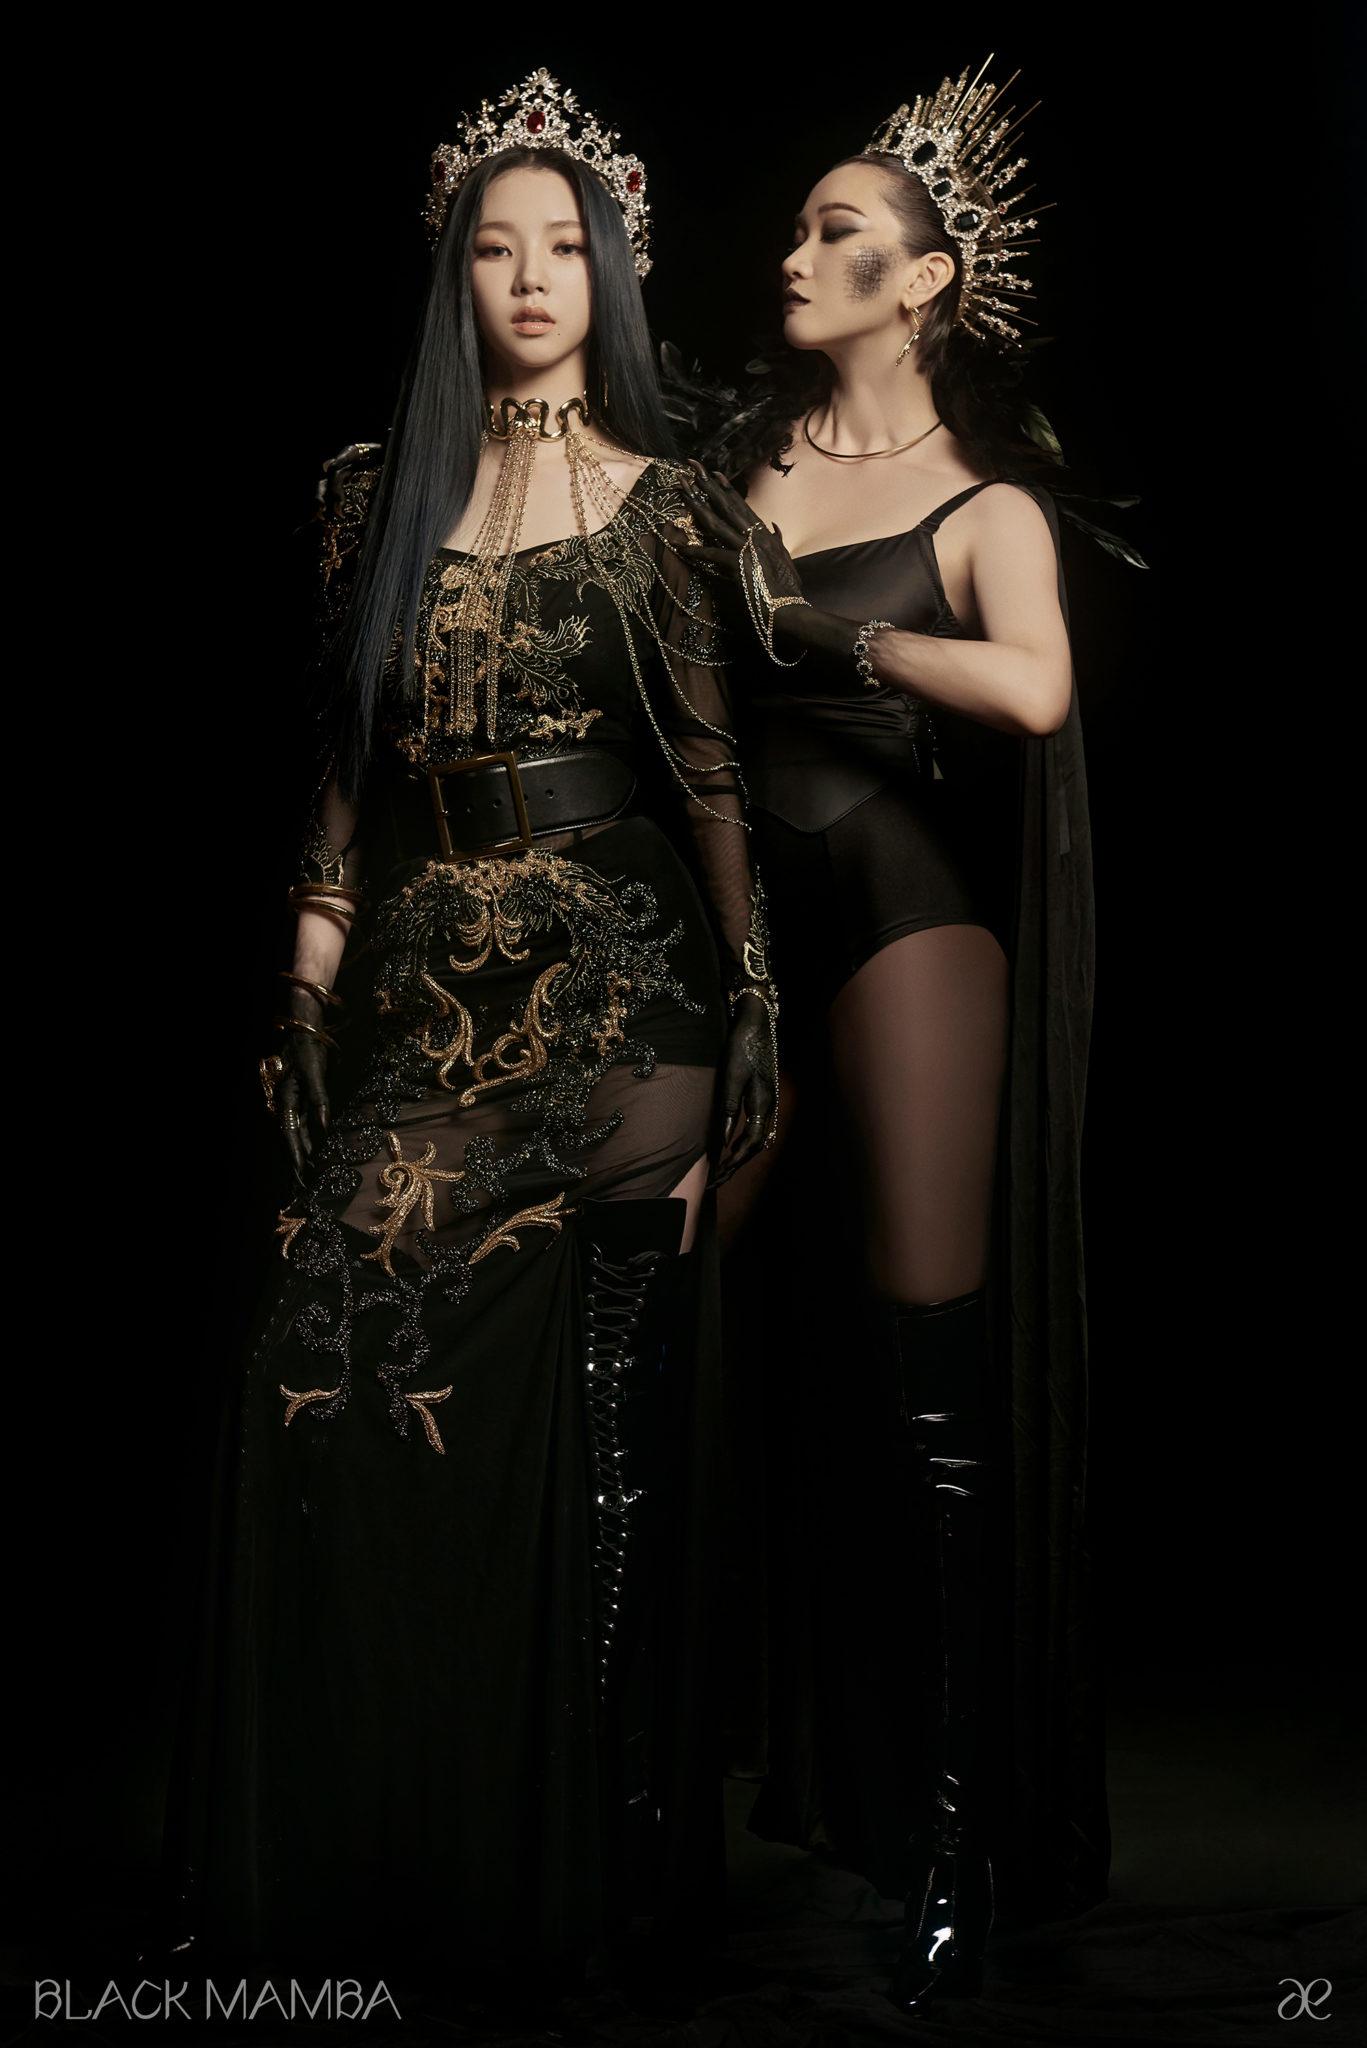 aespa's Karina Meets 'Black Mamba' Character in Debut Teaser